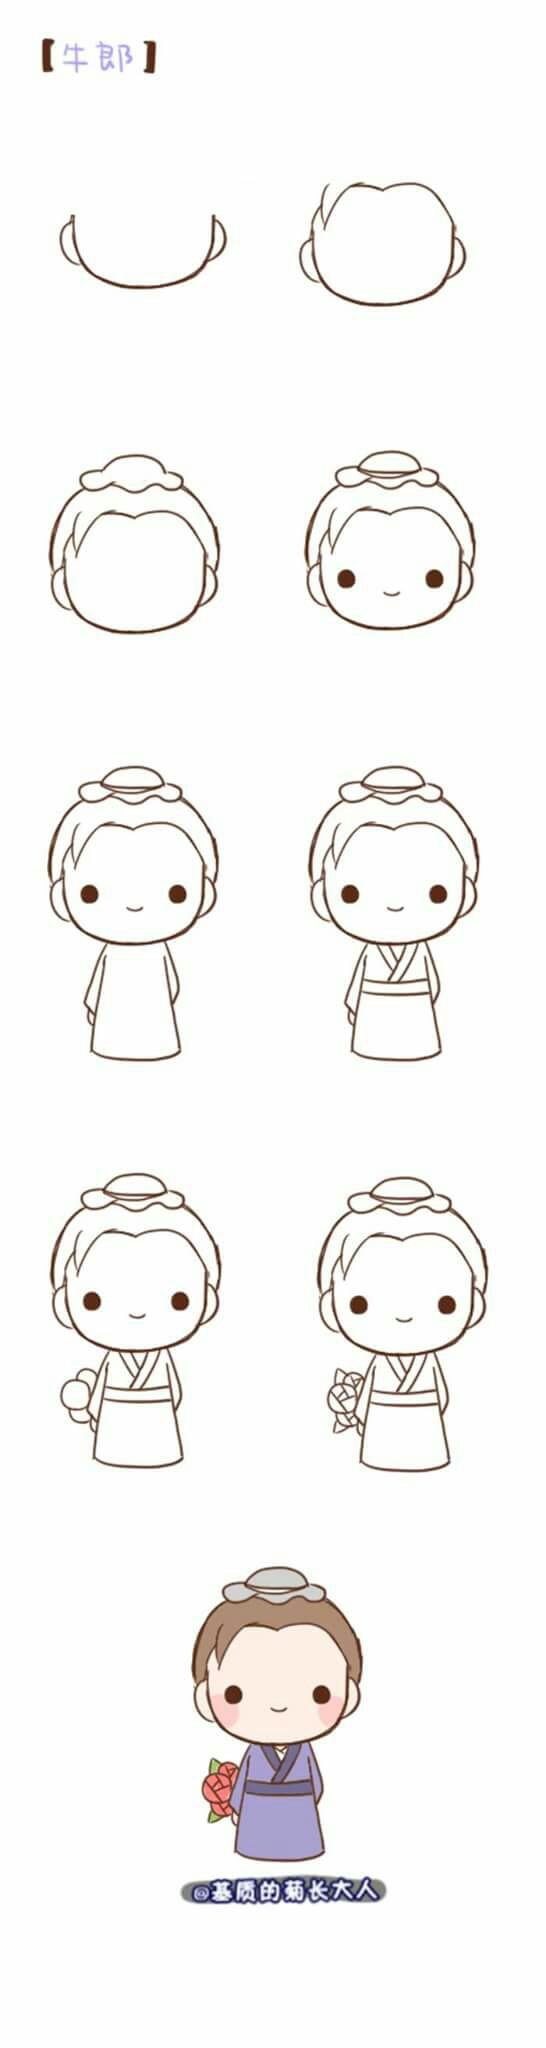 Chibi Japanese Villager Easy Drawings Chibi Drawings Kawaii Drawings